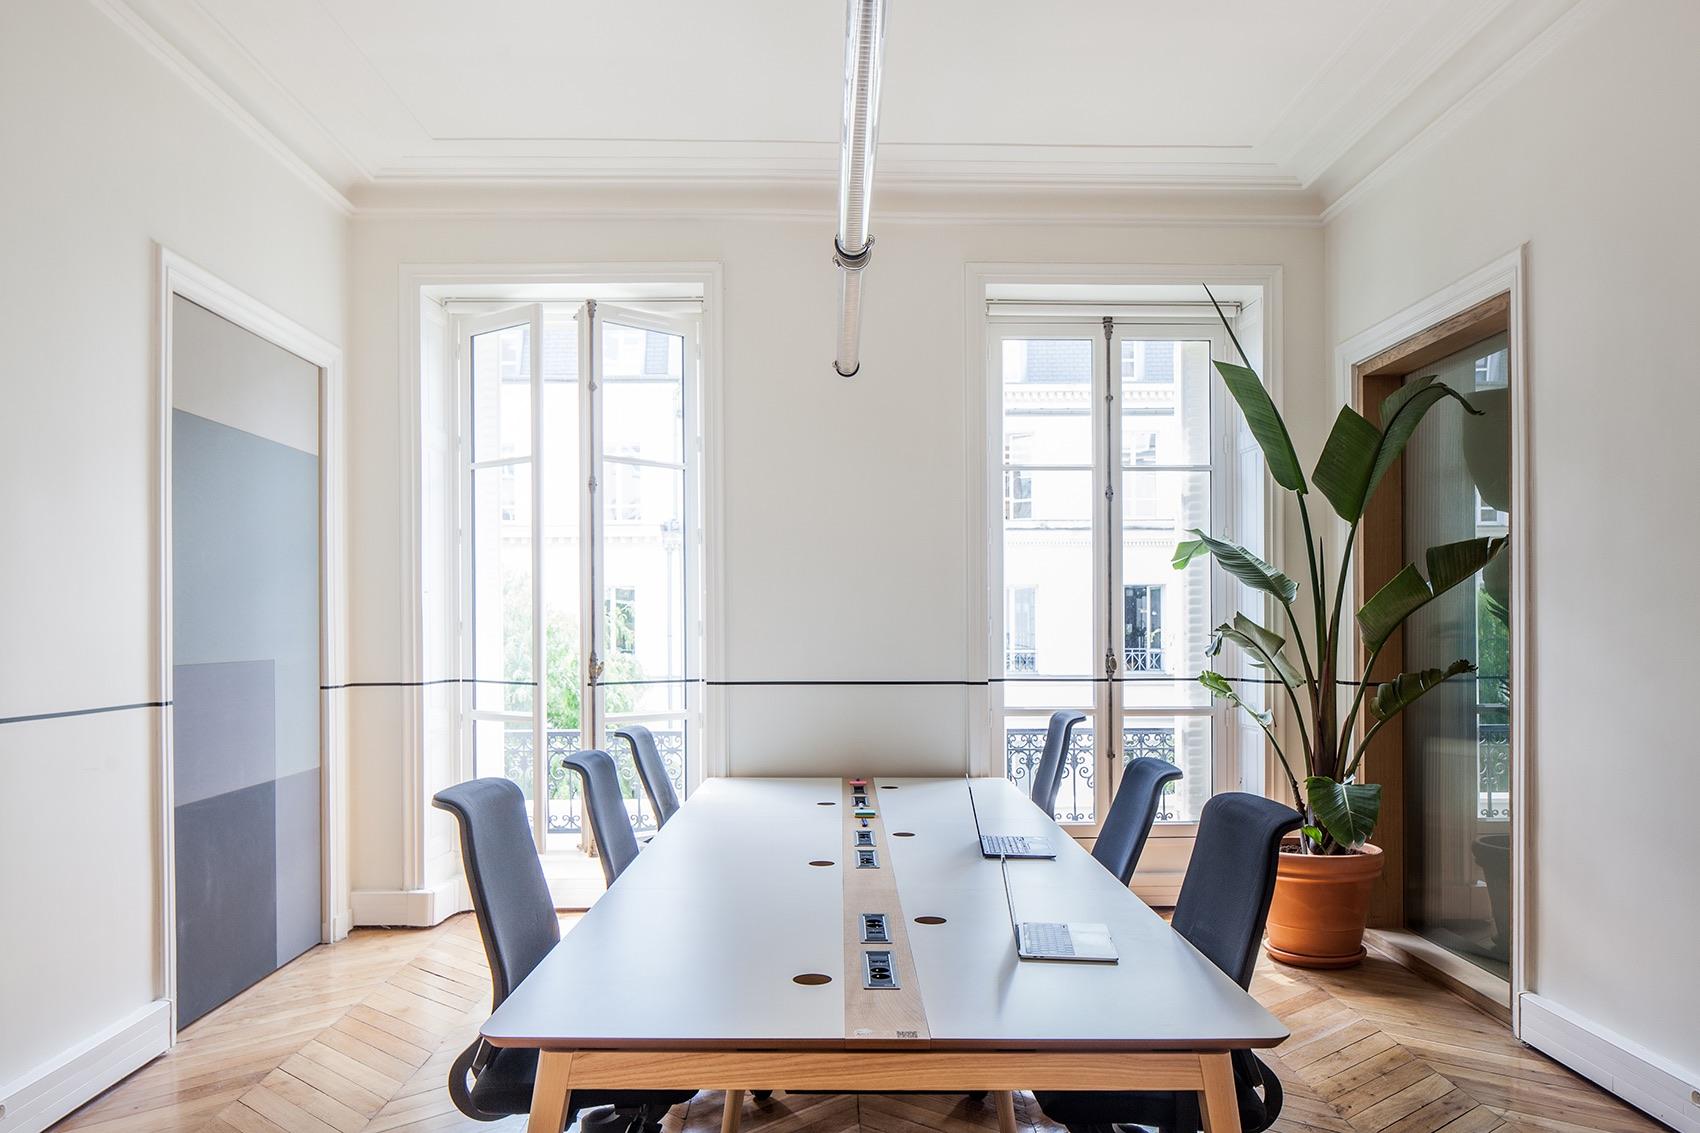 pwc-paris-office-7